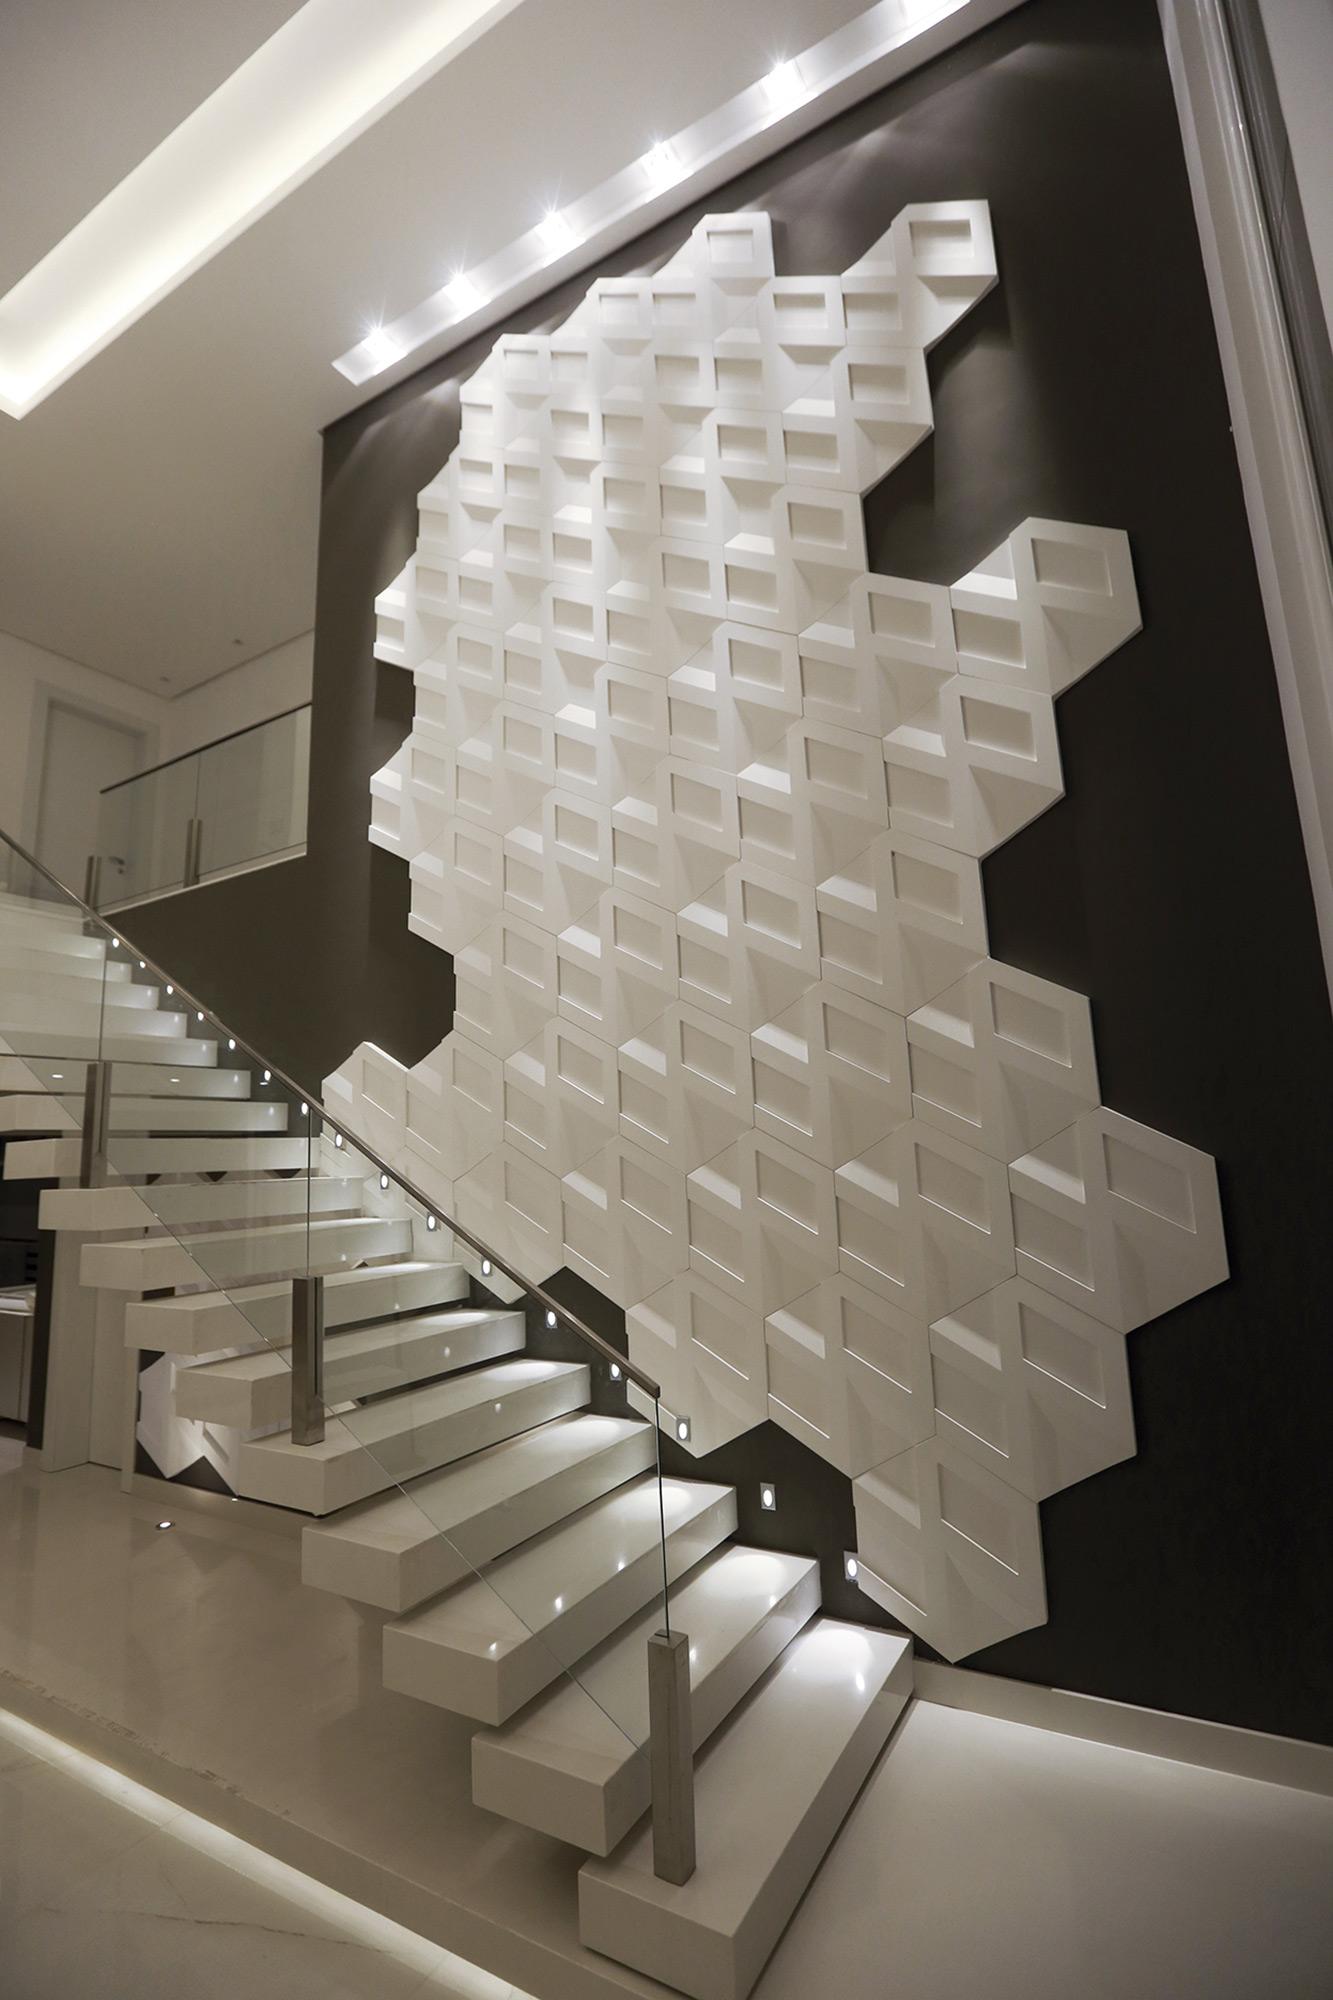 Infinity Paris Branco - Arquiteta Patrícia Pons - Foto Edinei Teixeira